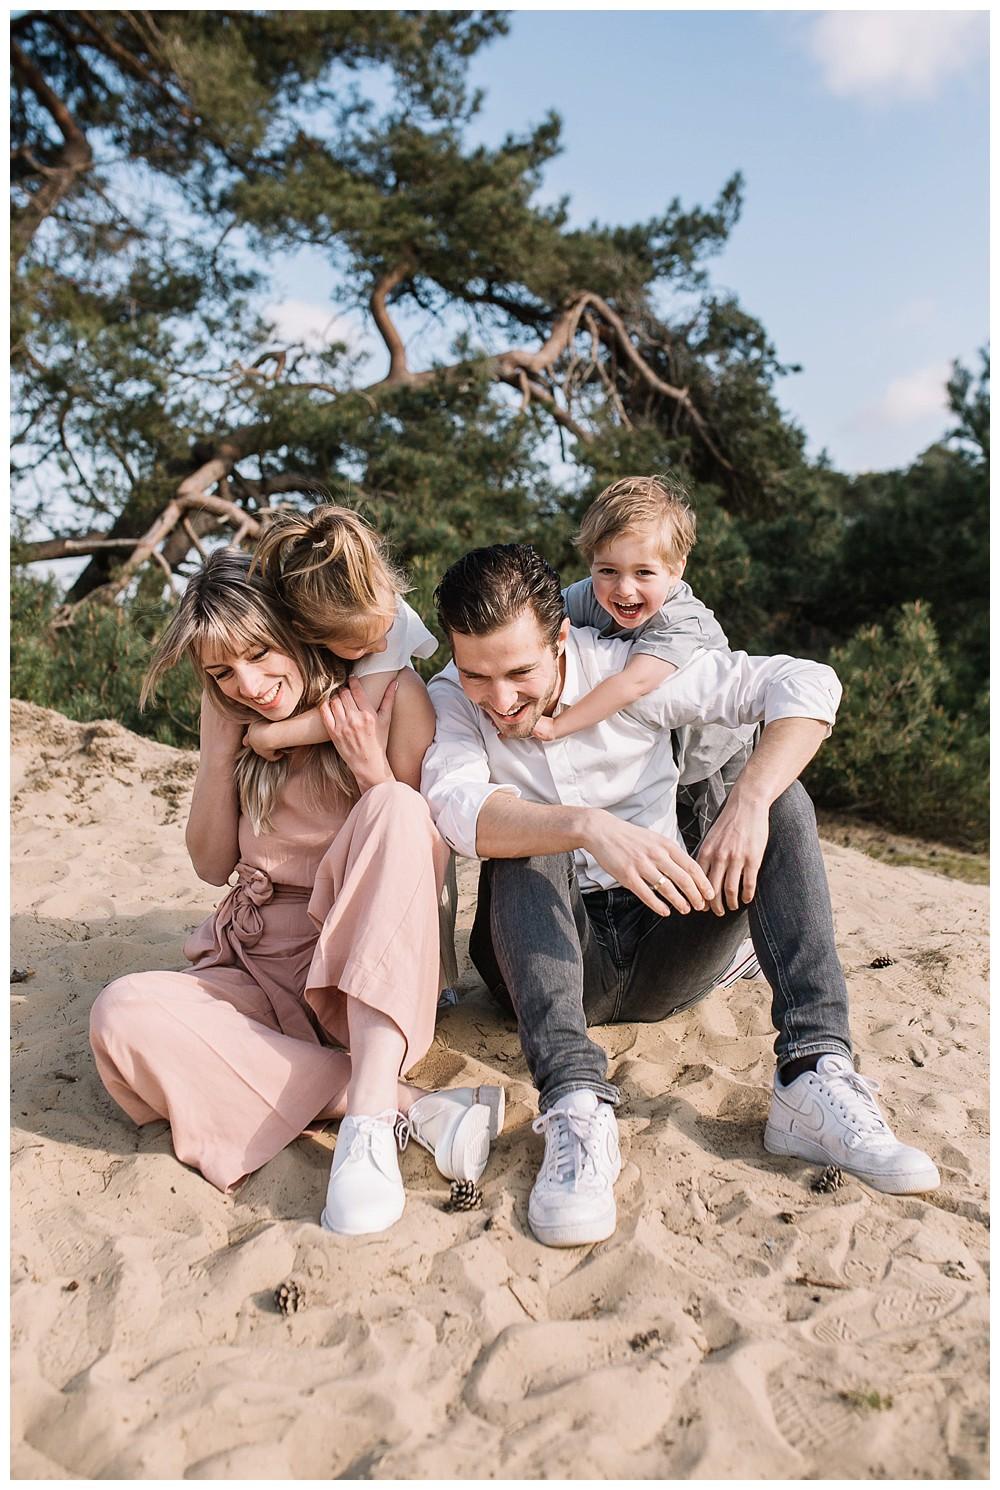 ohbelle_website_blog_gezinsshoot_Lifestyle_buiten_0256-kopie Lifestyle gezinsshoot Wekeromse Zand